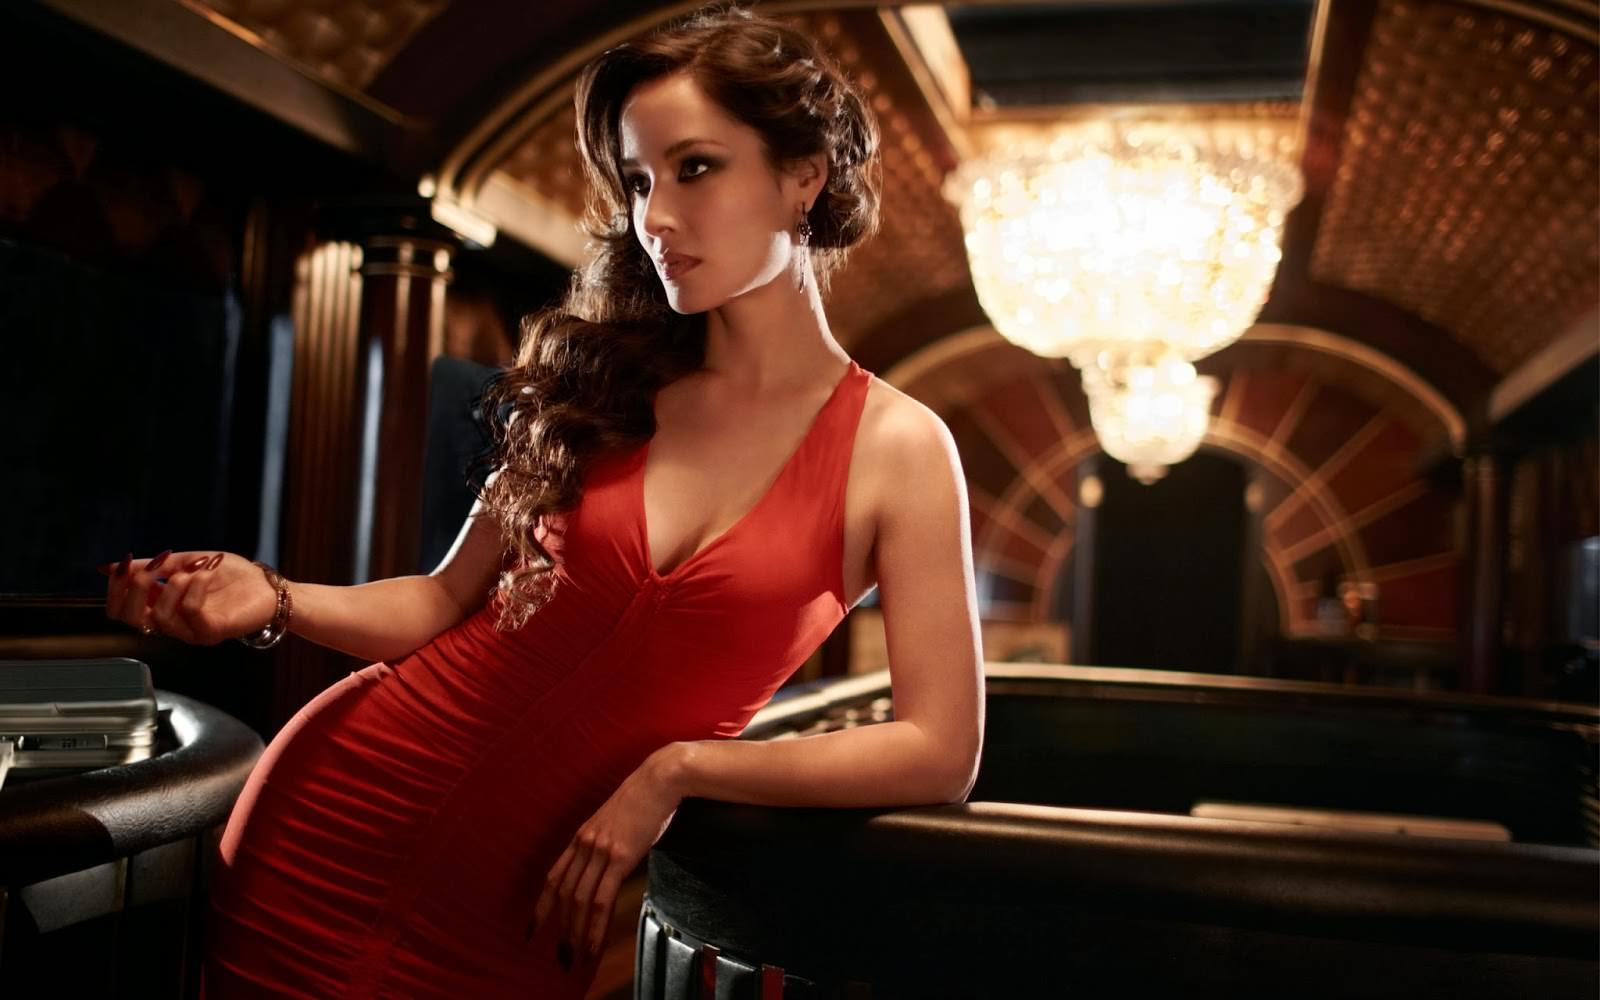 Hairstyles: 5 Bond Girl Looks